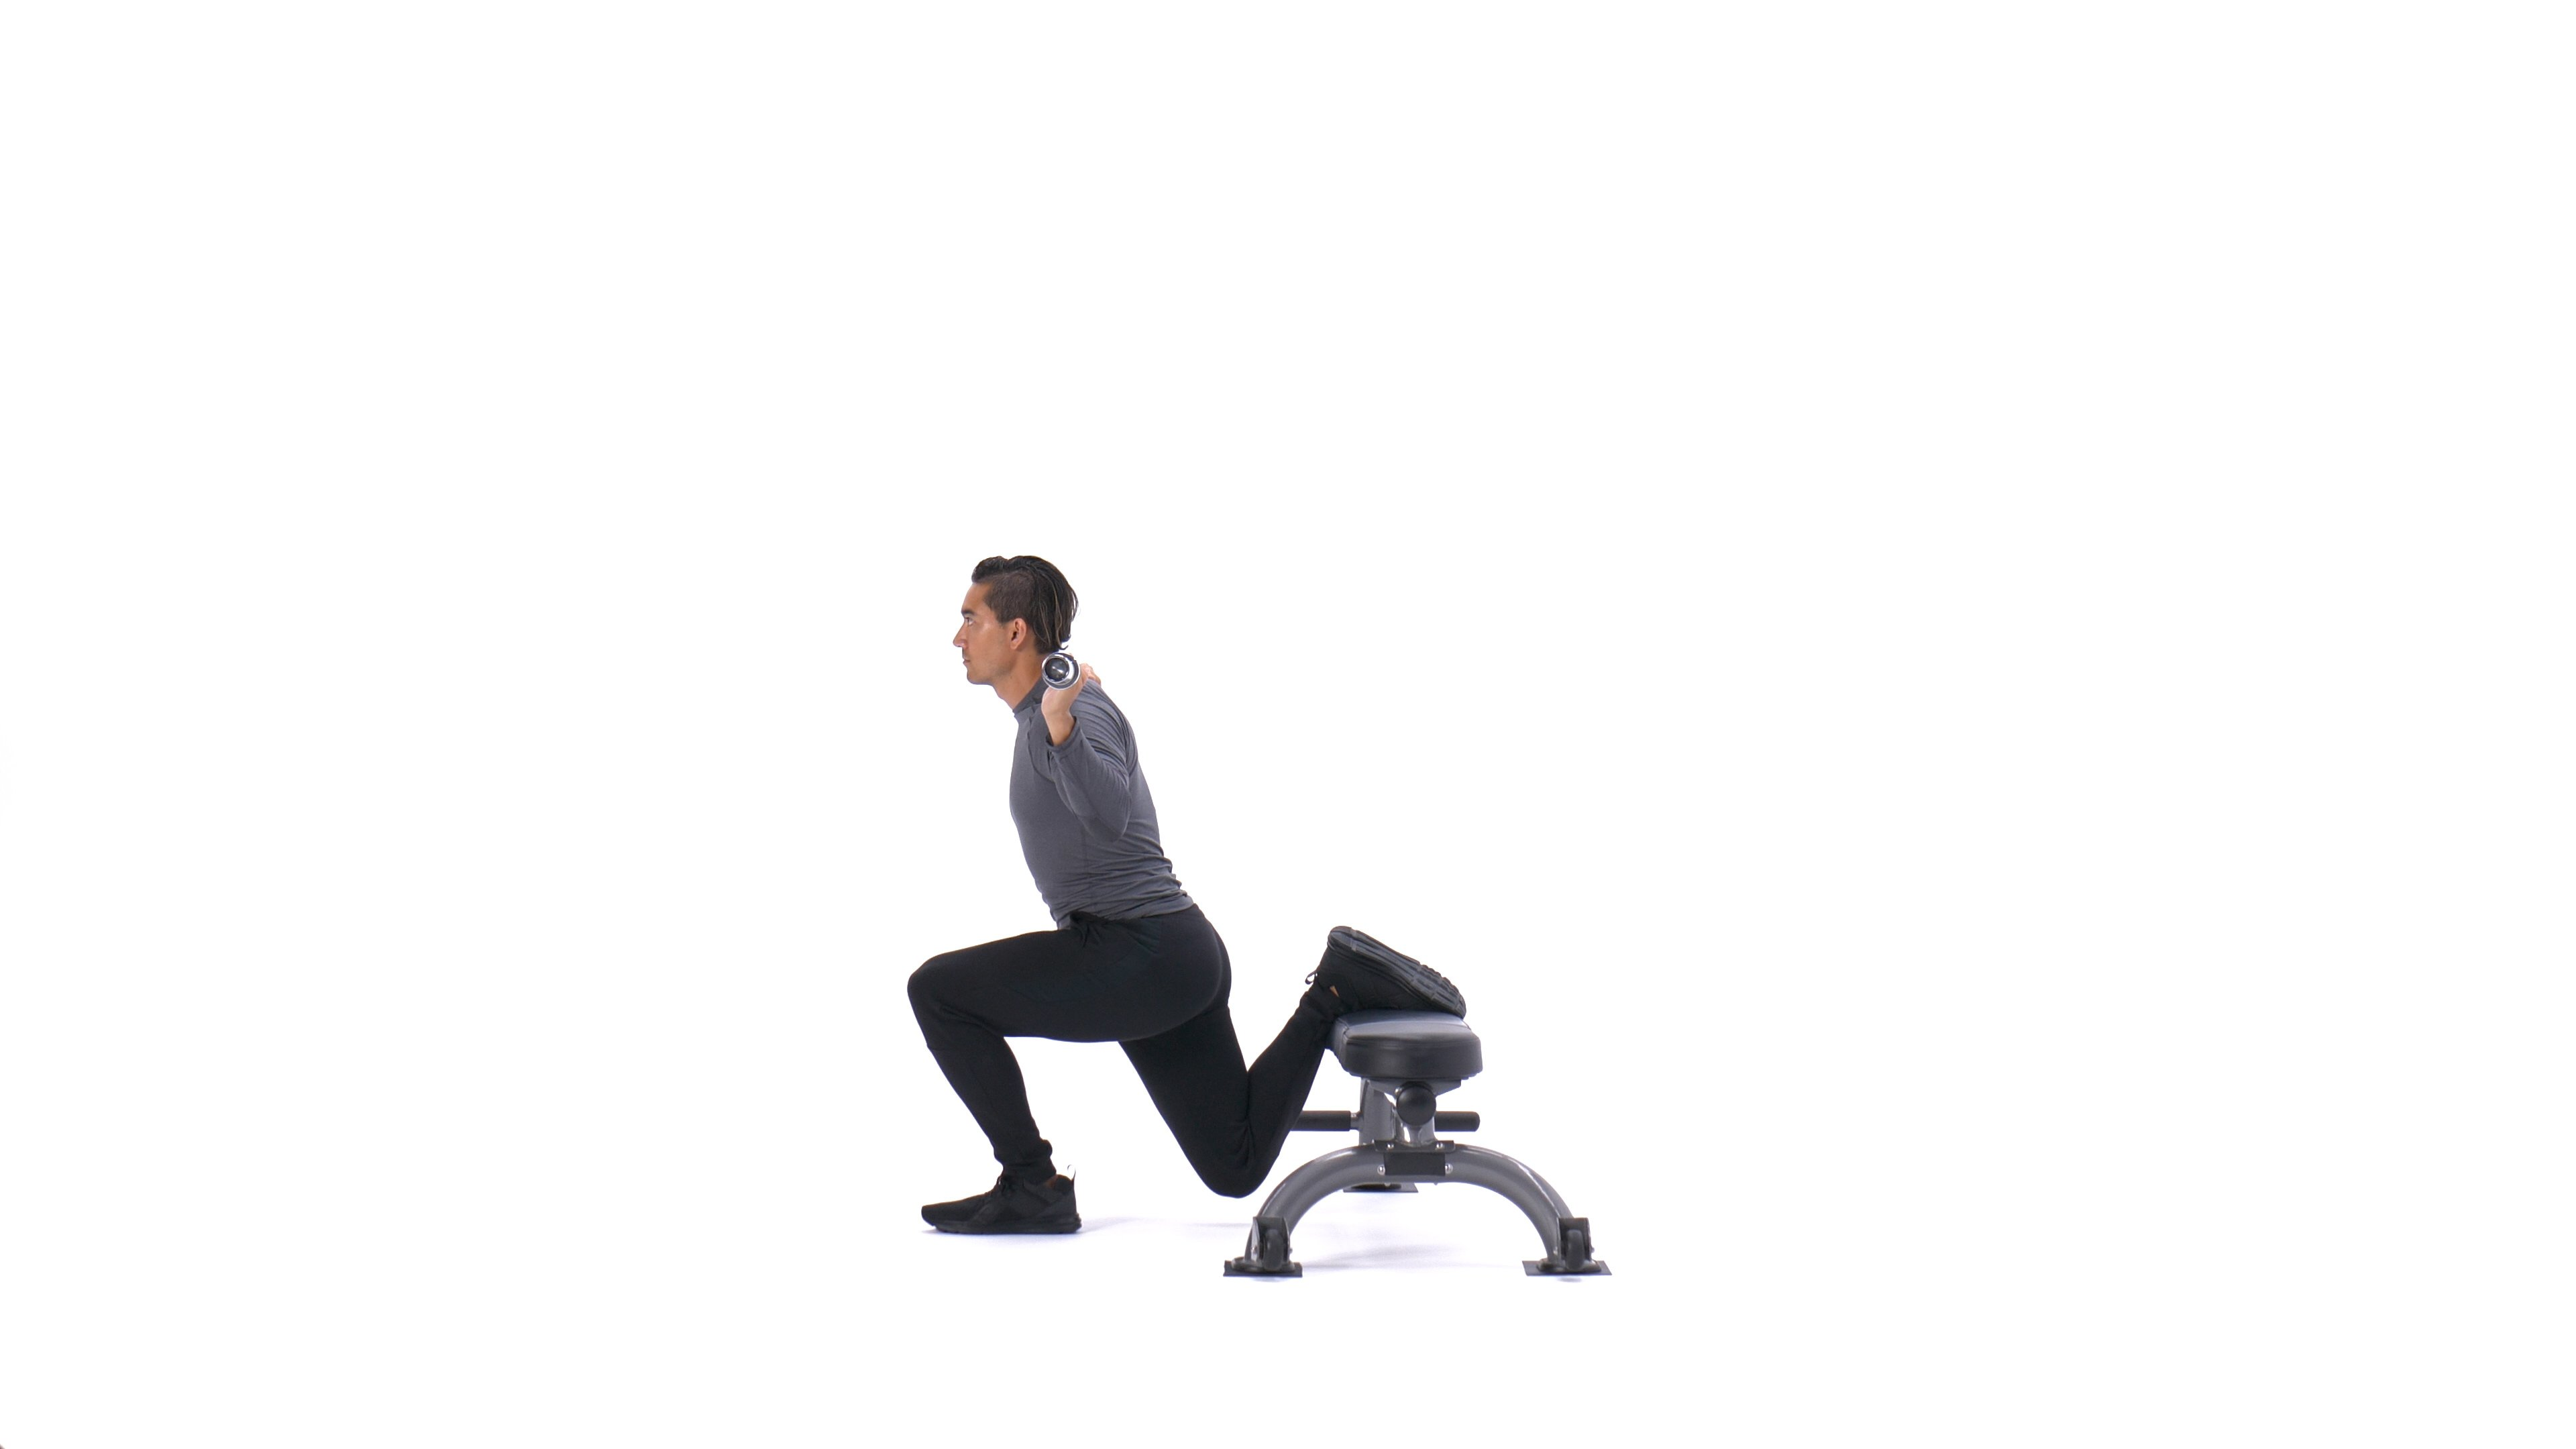 Barbell Bulgarian split squat image